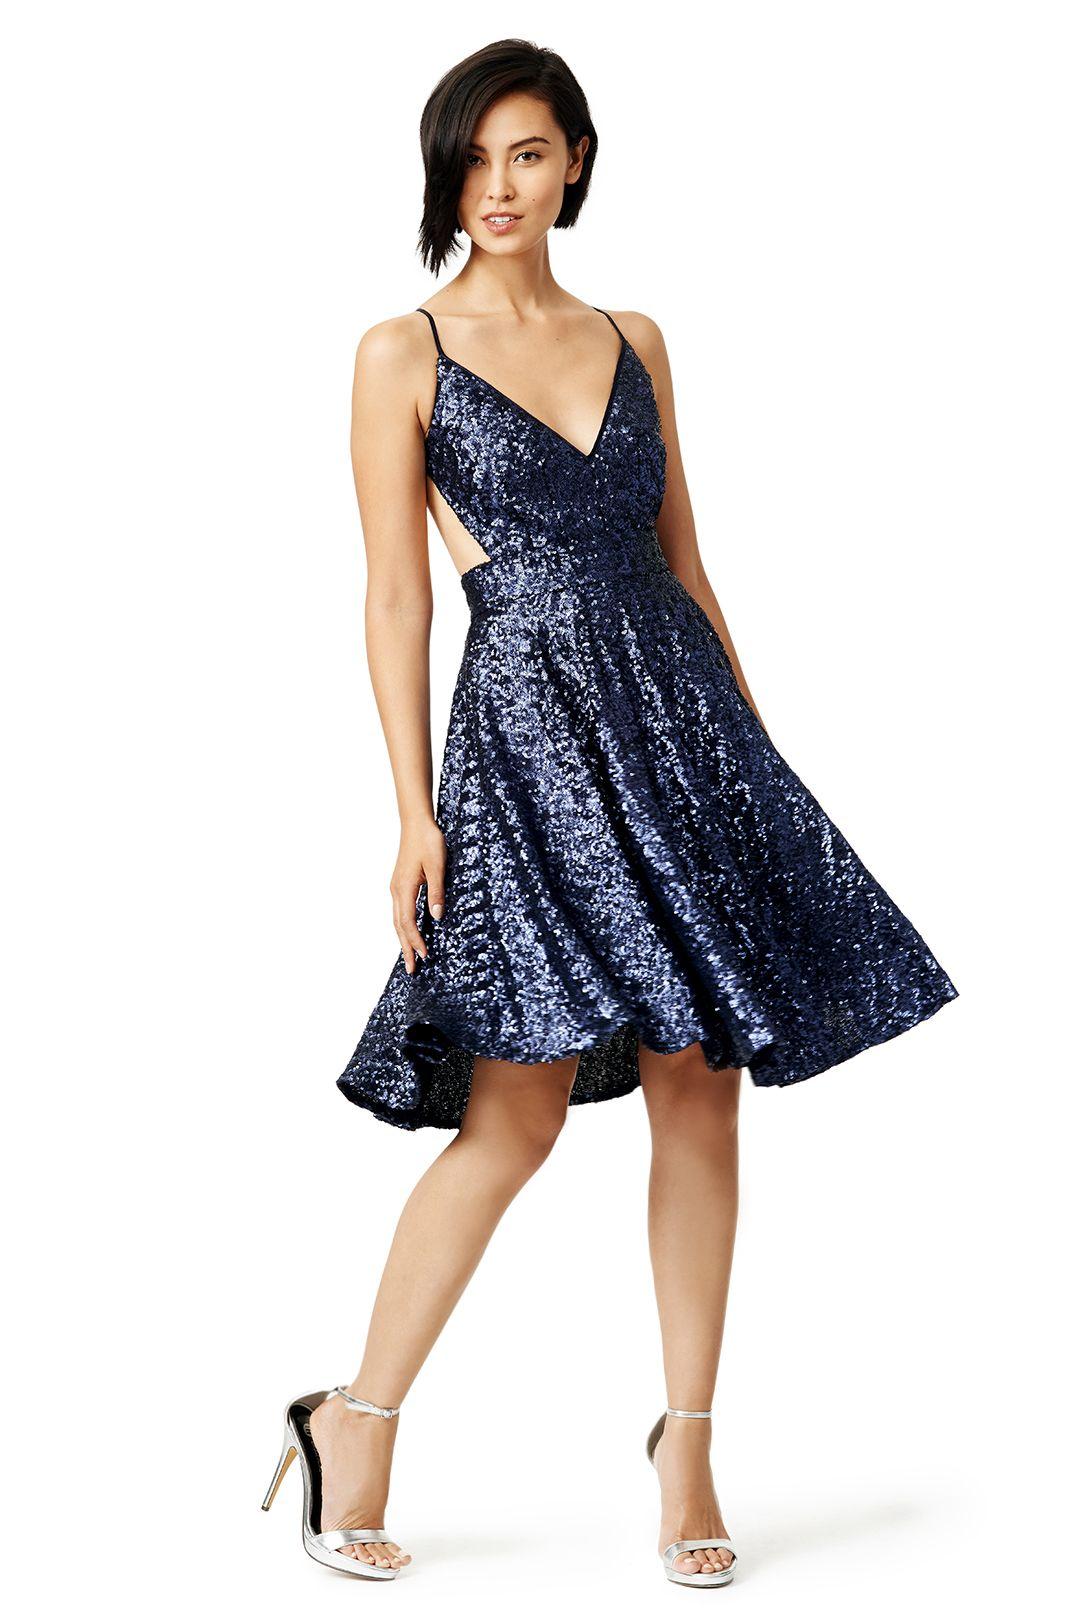 Contrarian Sea Shimmer Dress | Shimmer dress, Dresses ...